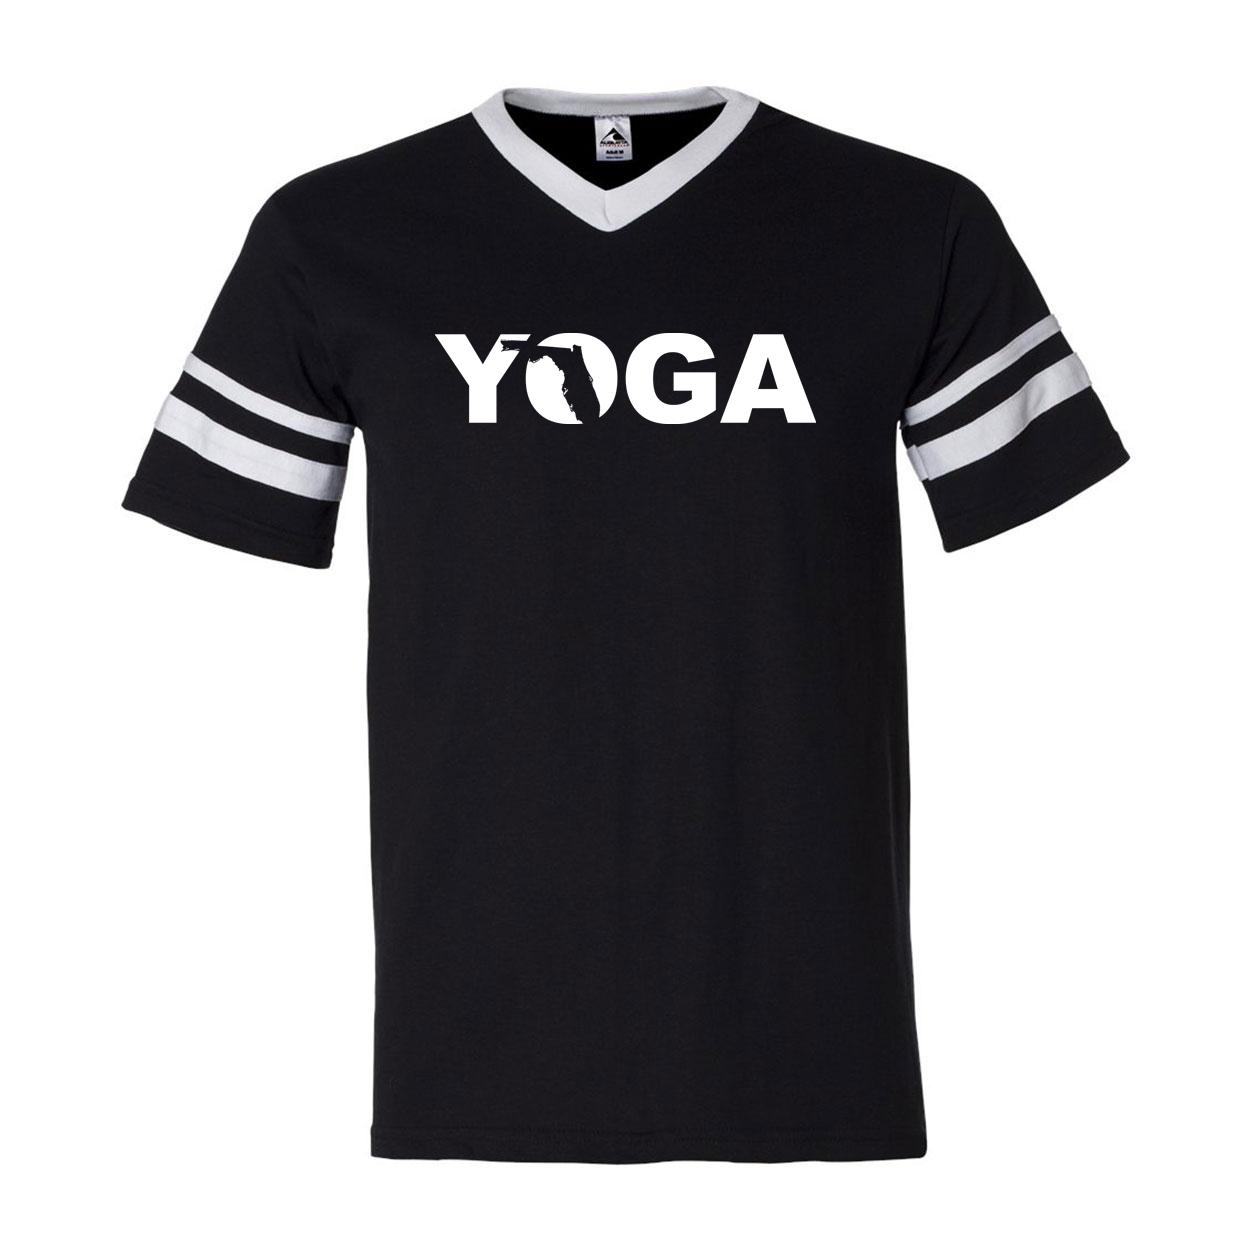 Yoga Florida Classic Premium Striped Jersey T-Shirt Black/White (White Logo)